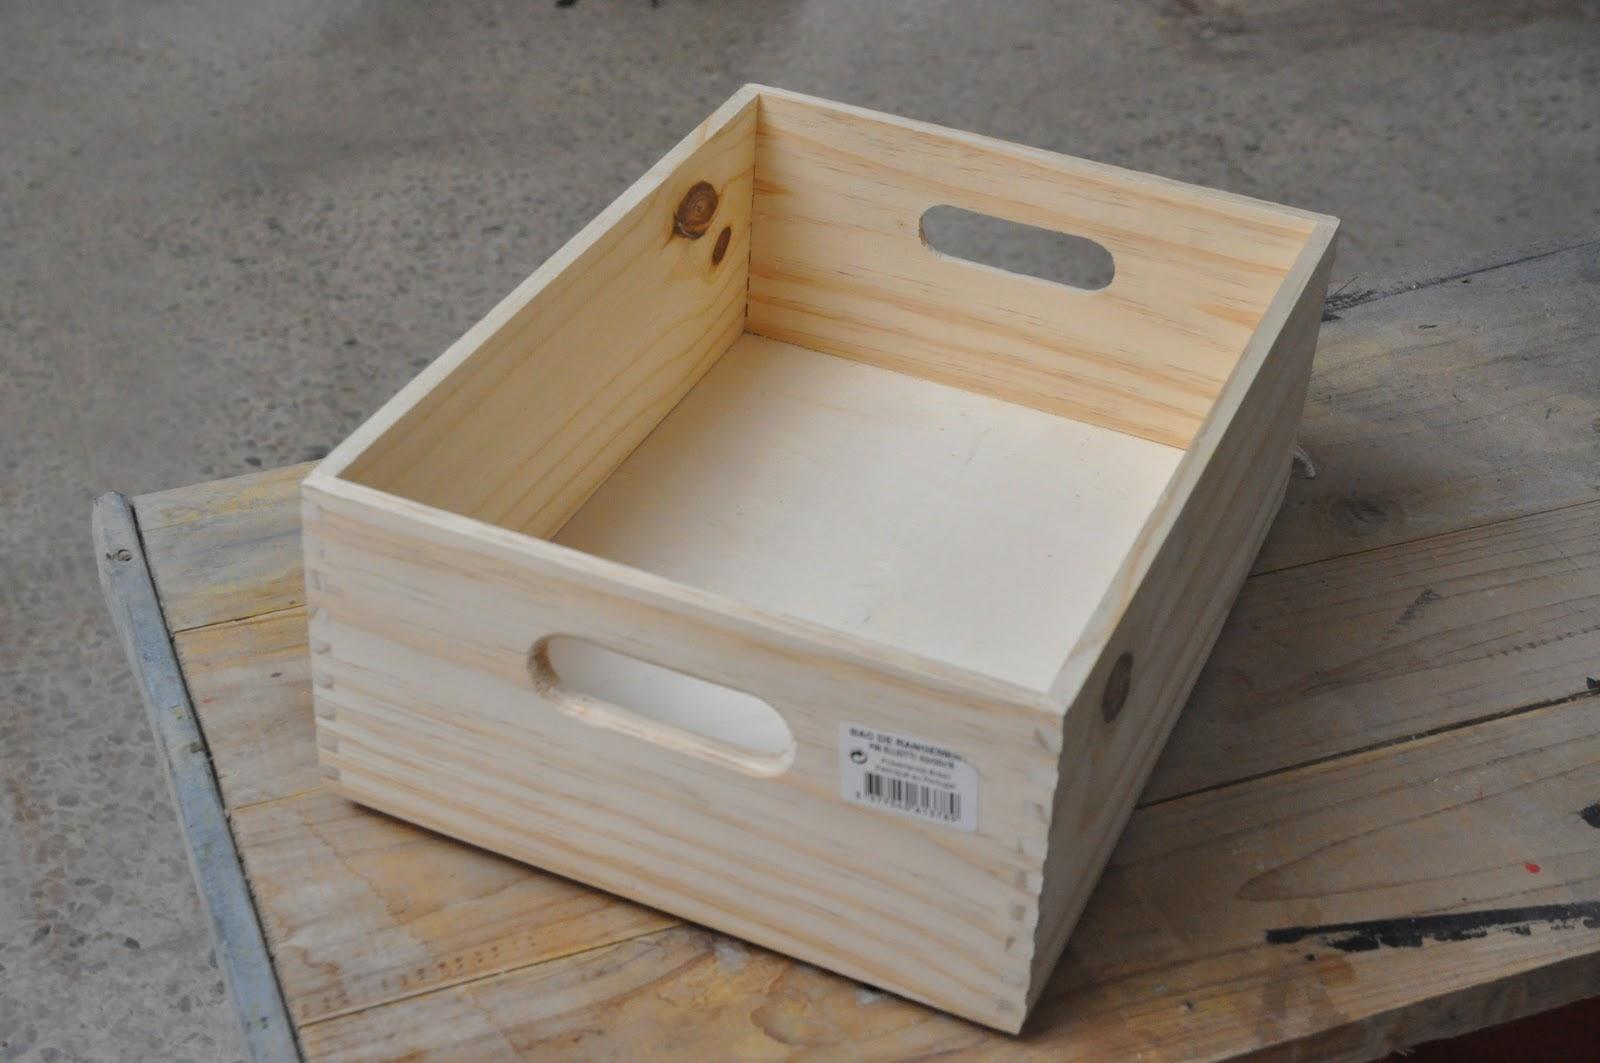 Esp ritu chamarilero estanter as con cajas de madera - Caja de frutas de madera ...